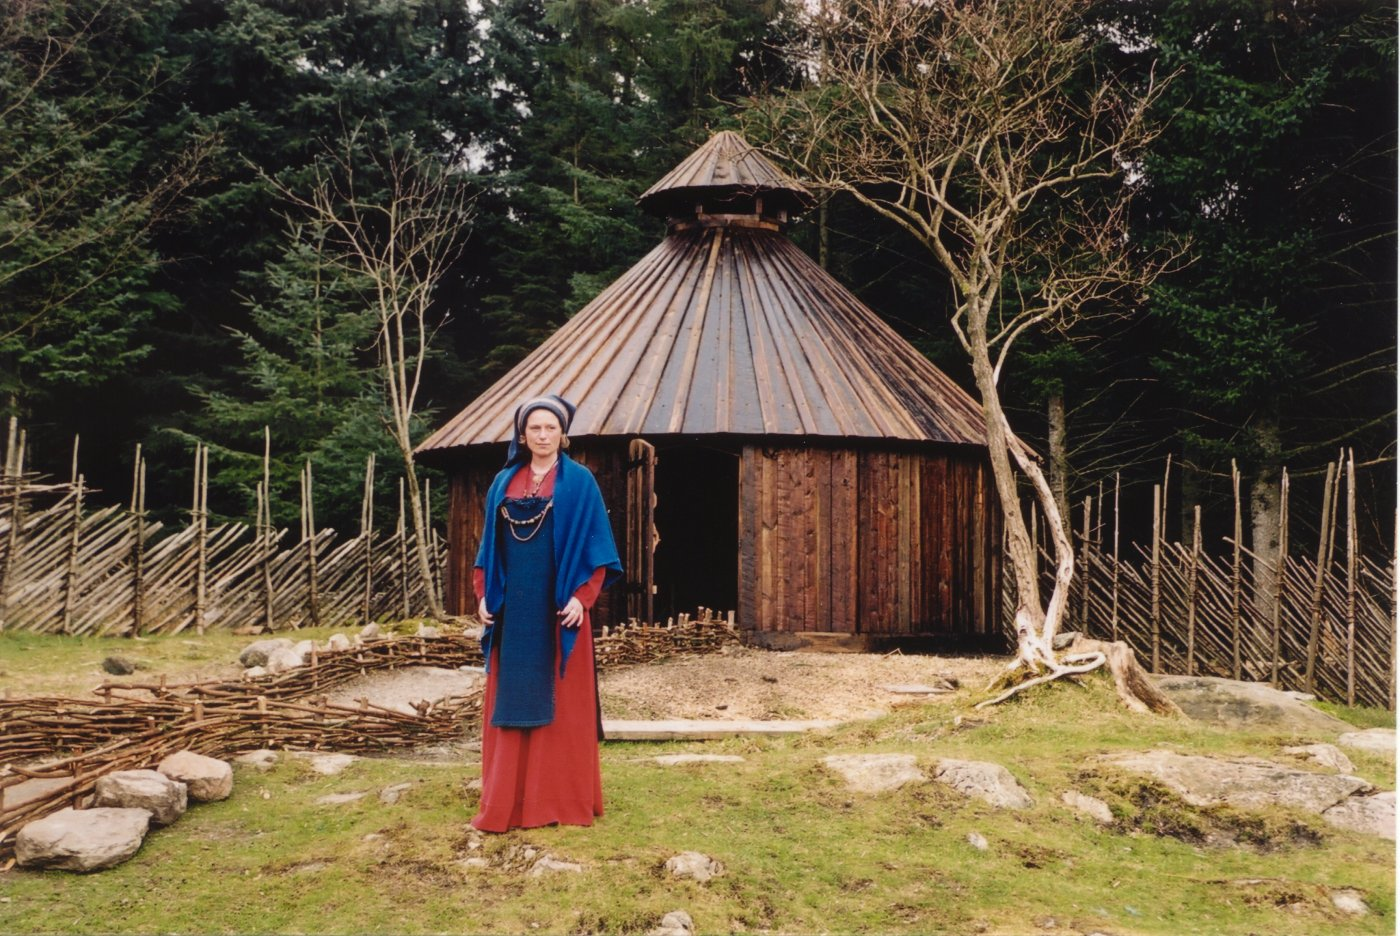 Rundhus Avaldsnes Vikingtid